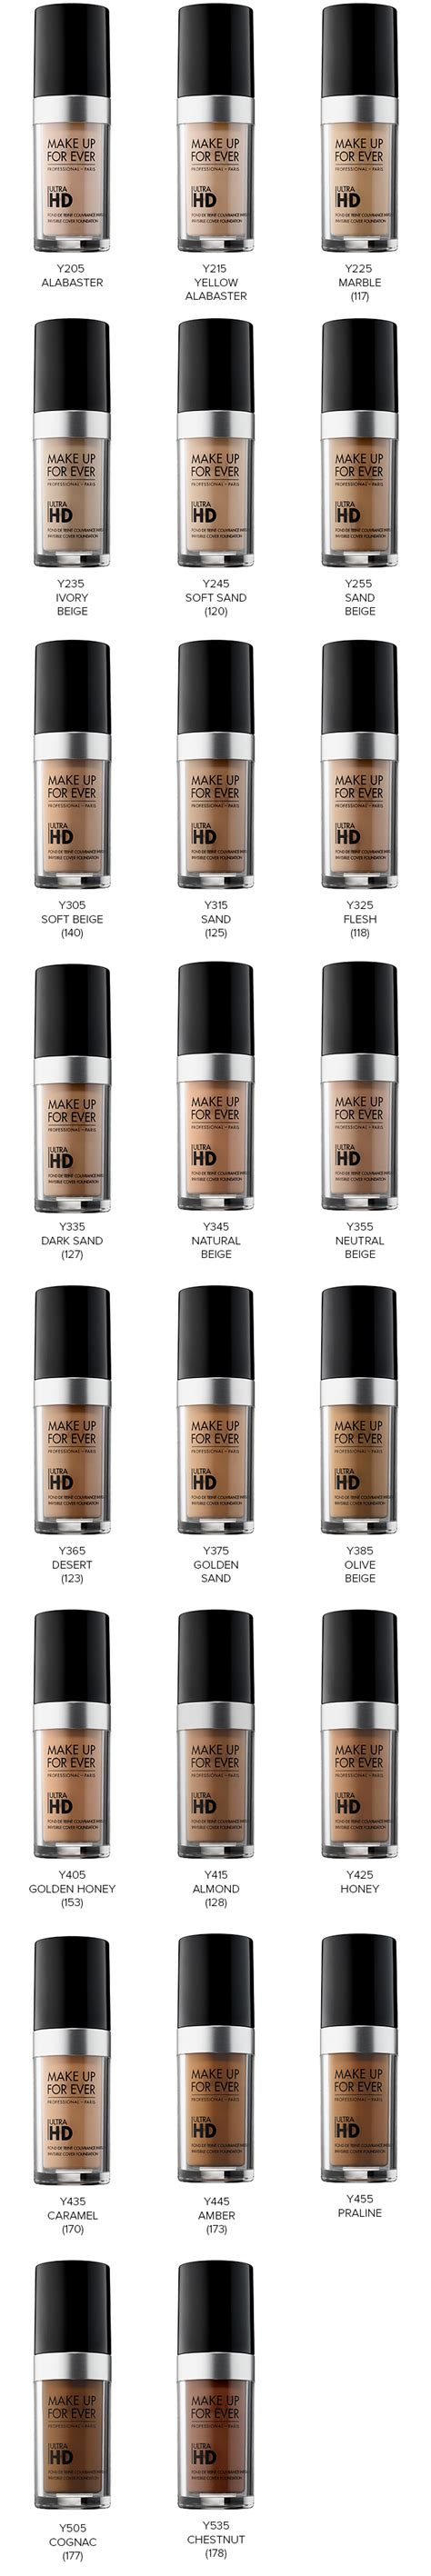 Foundation Make Ultra Hd make up for ultra hd foundation stick foundation